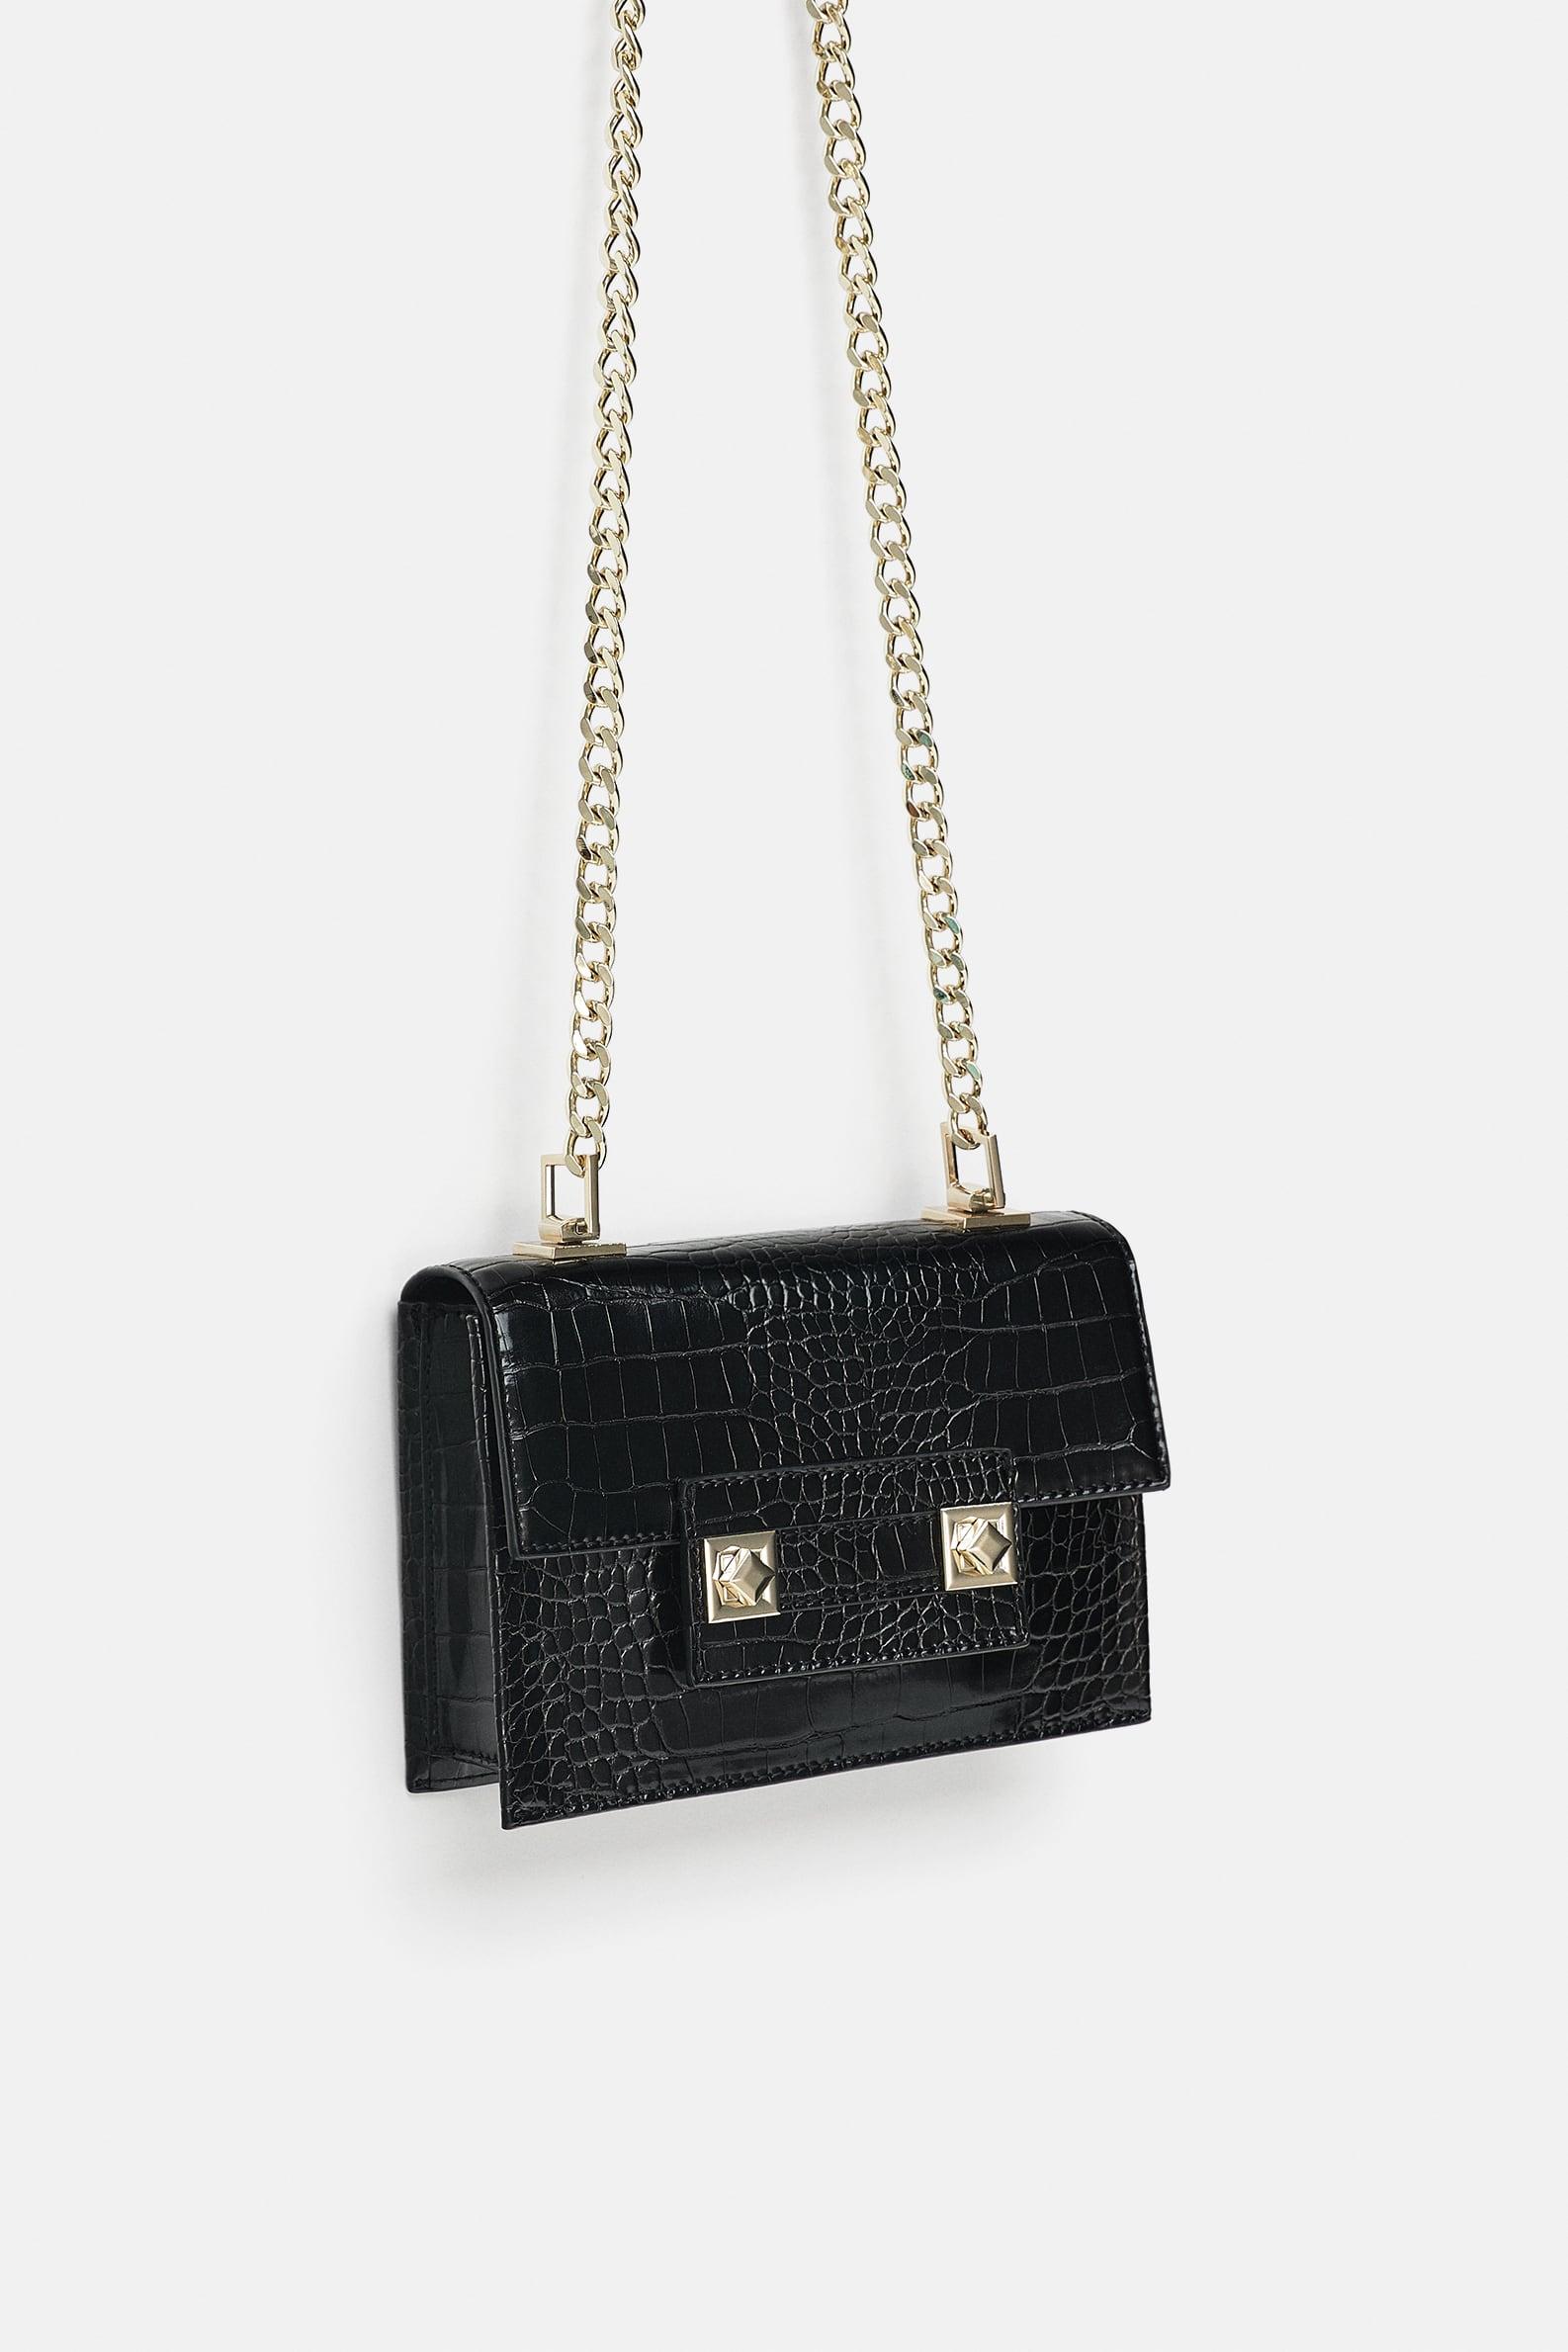 Zara MINI CROSSBODY BAG Black Croc